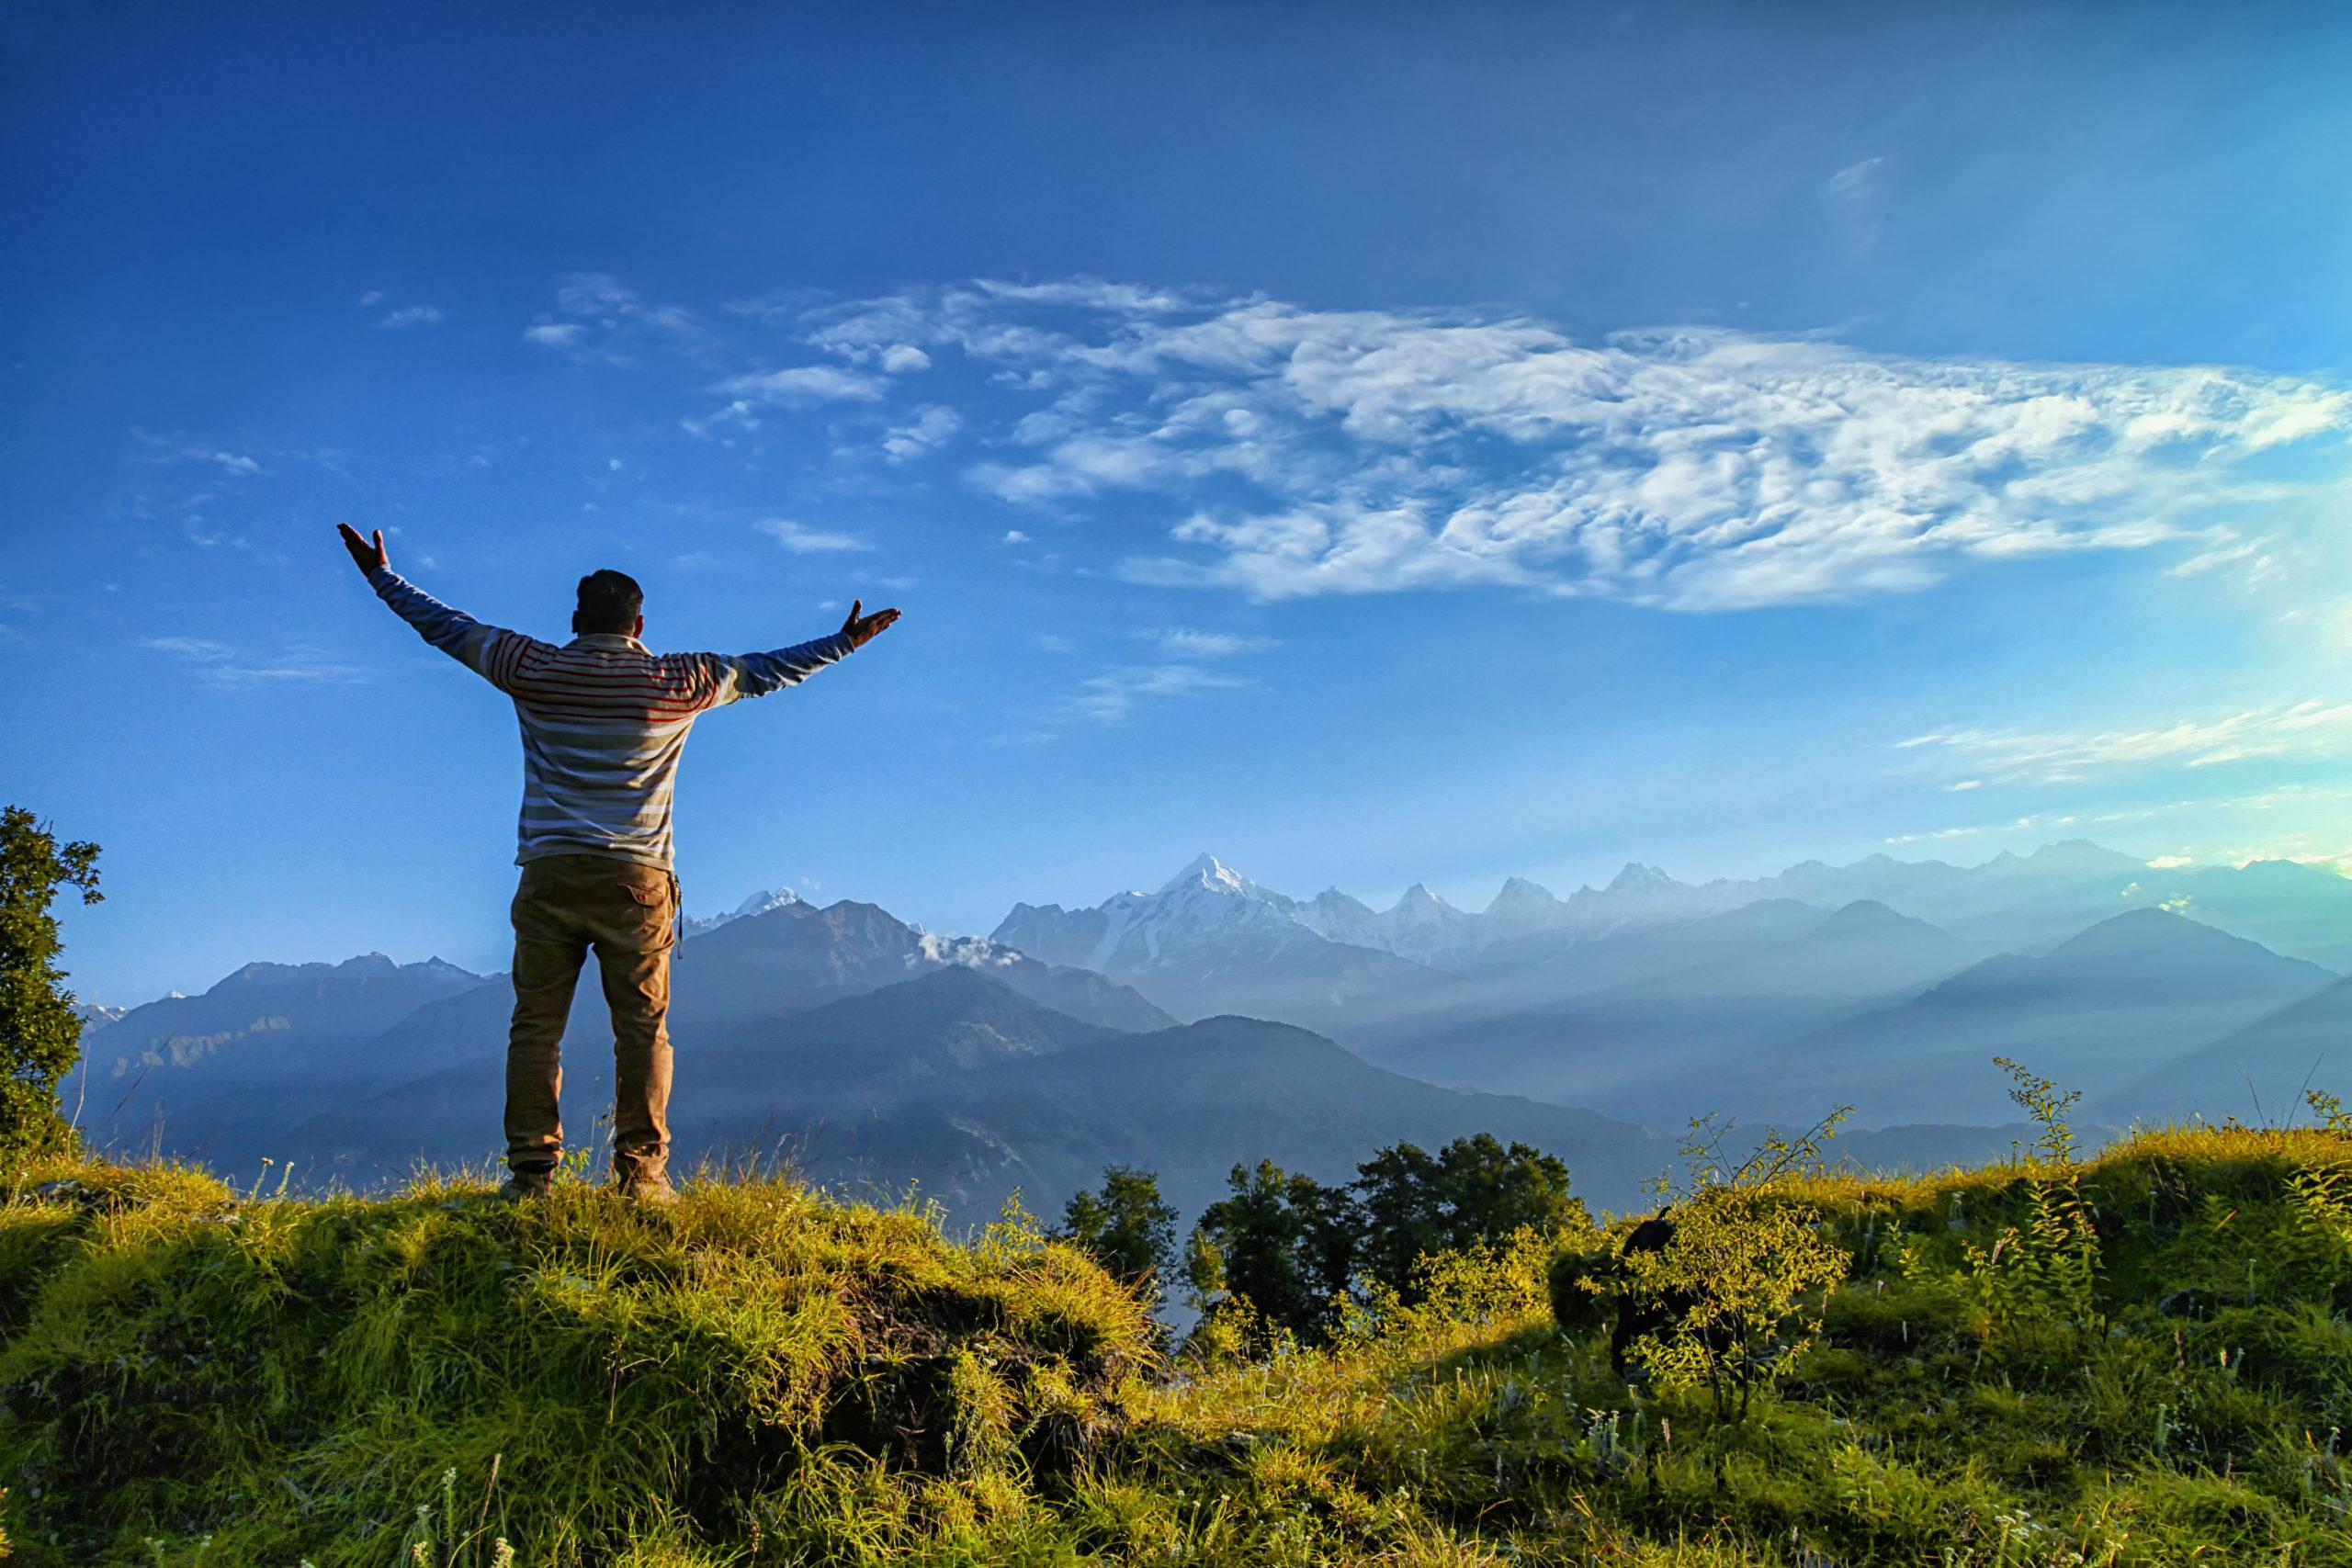 Man standing atop mountain